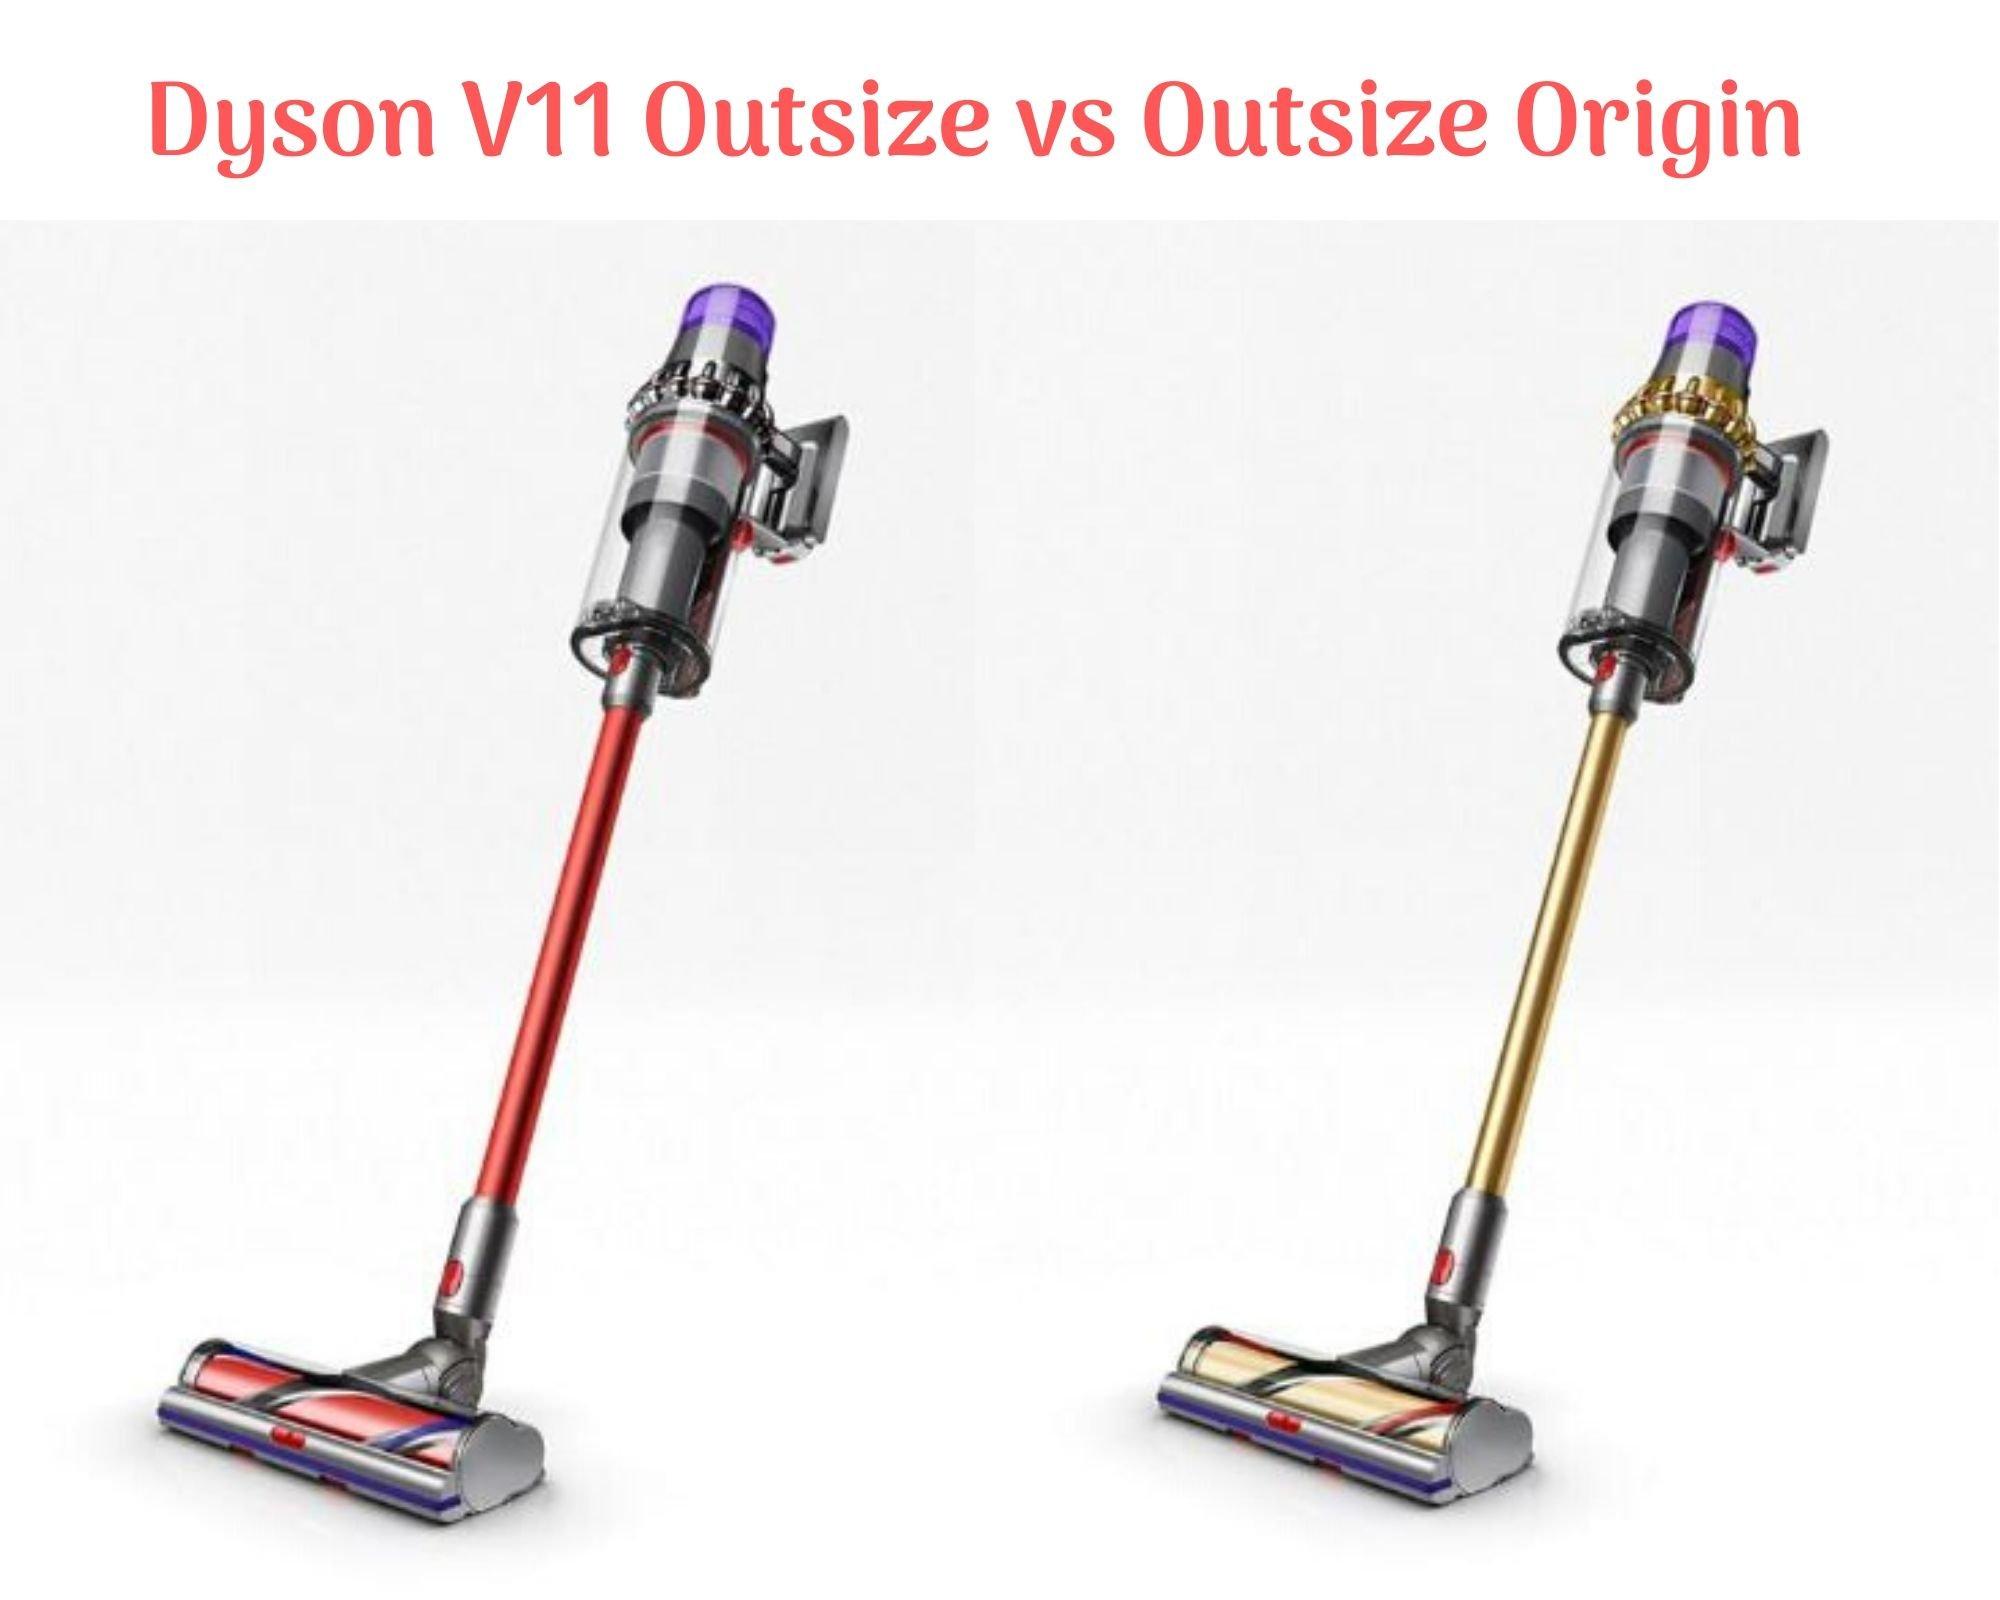 Dyson V11 Outsize Review (Dyson V11 Outsize vs Outsize Origin)